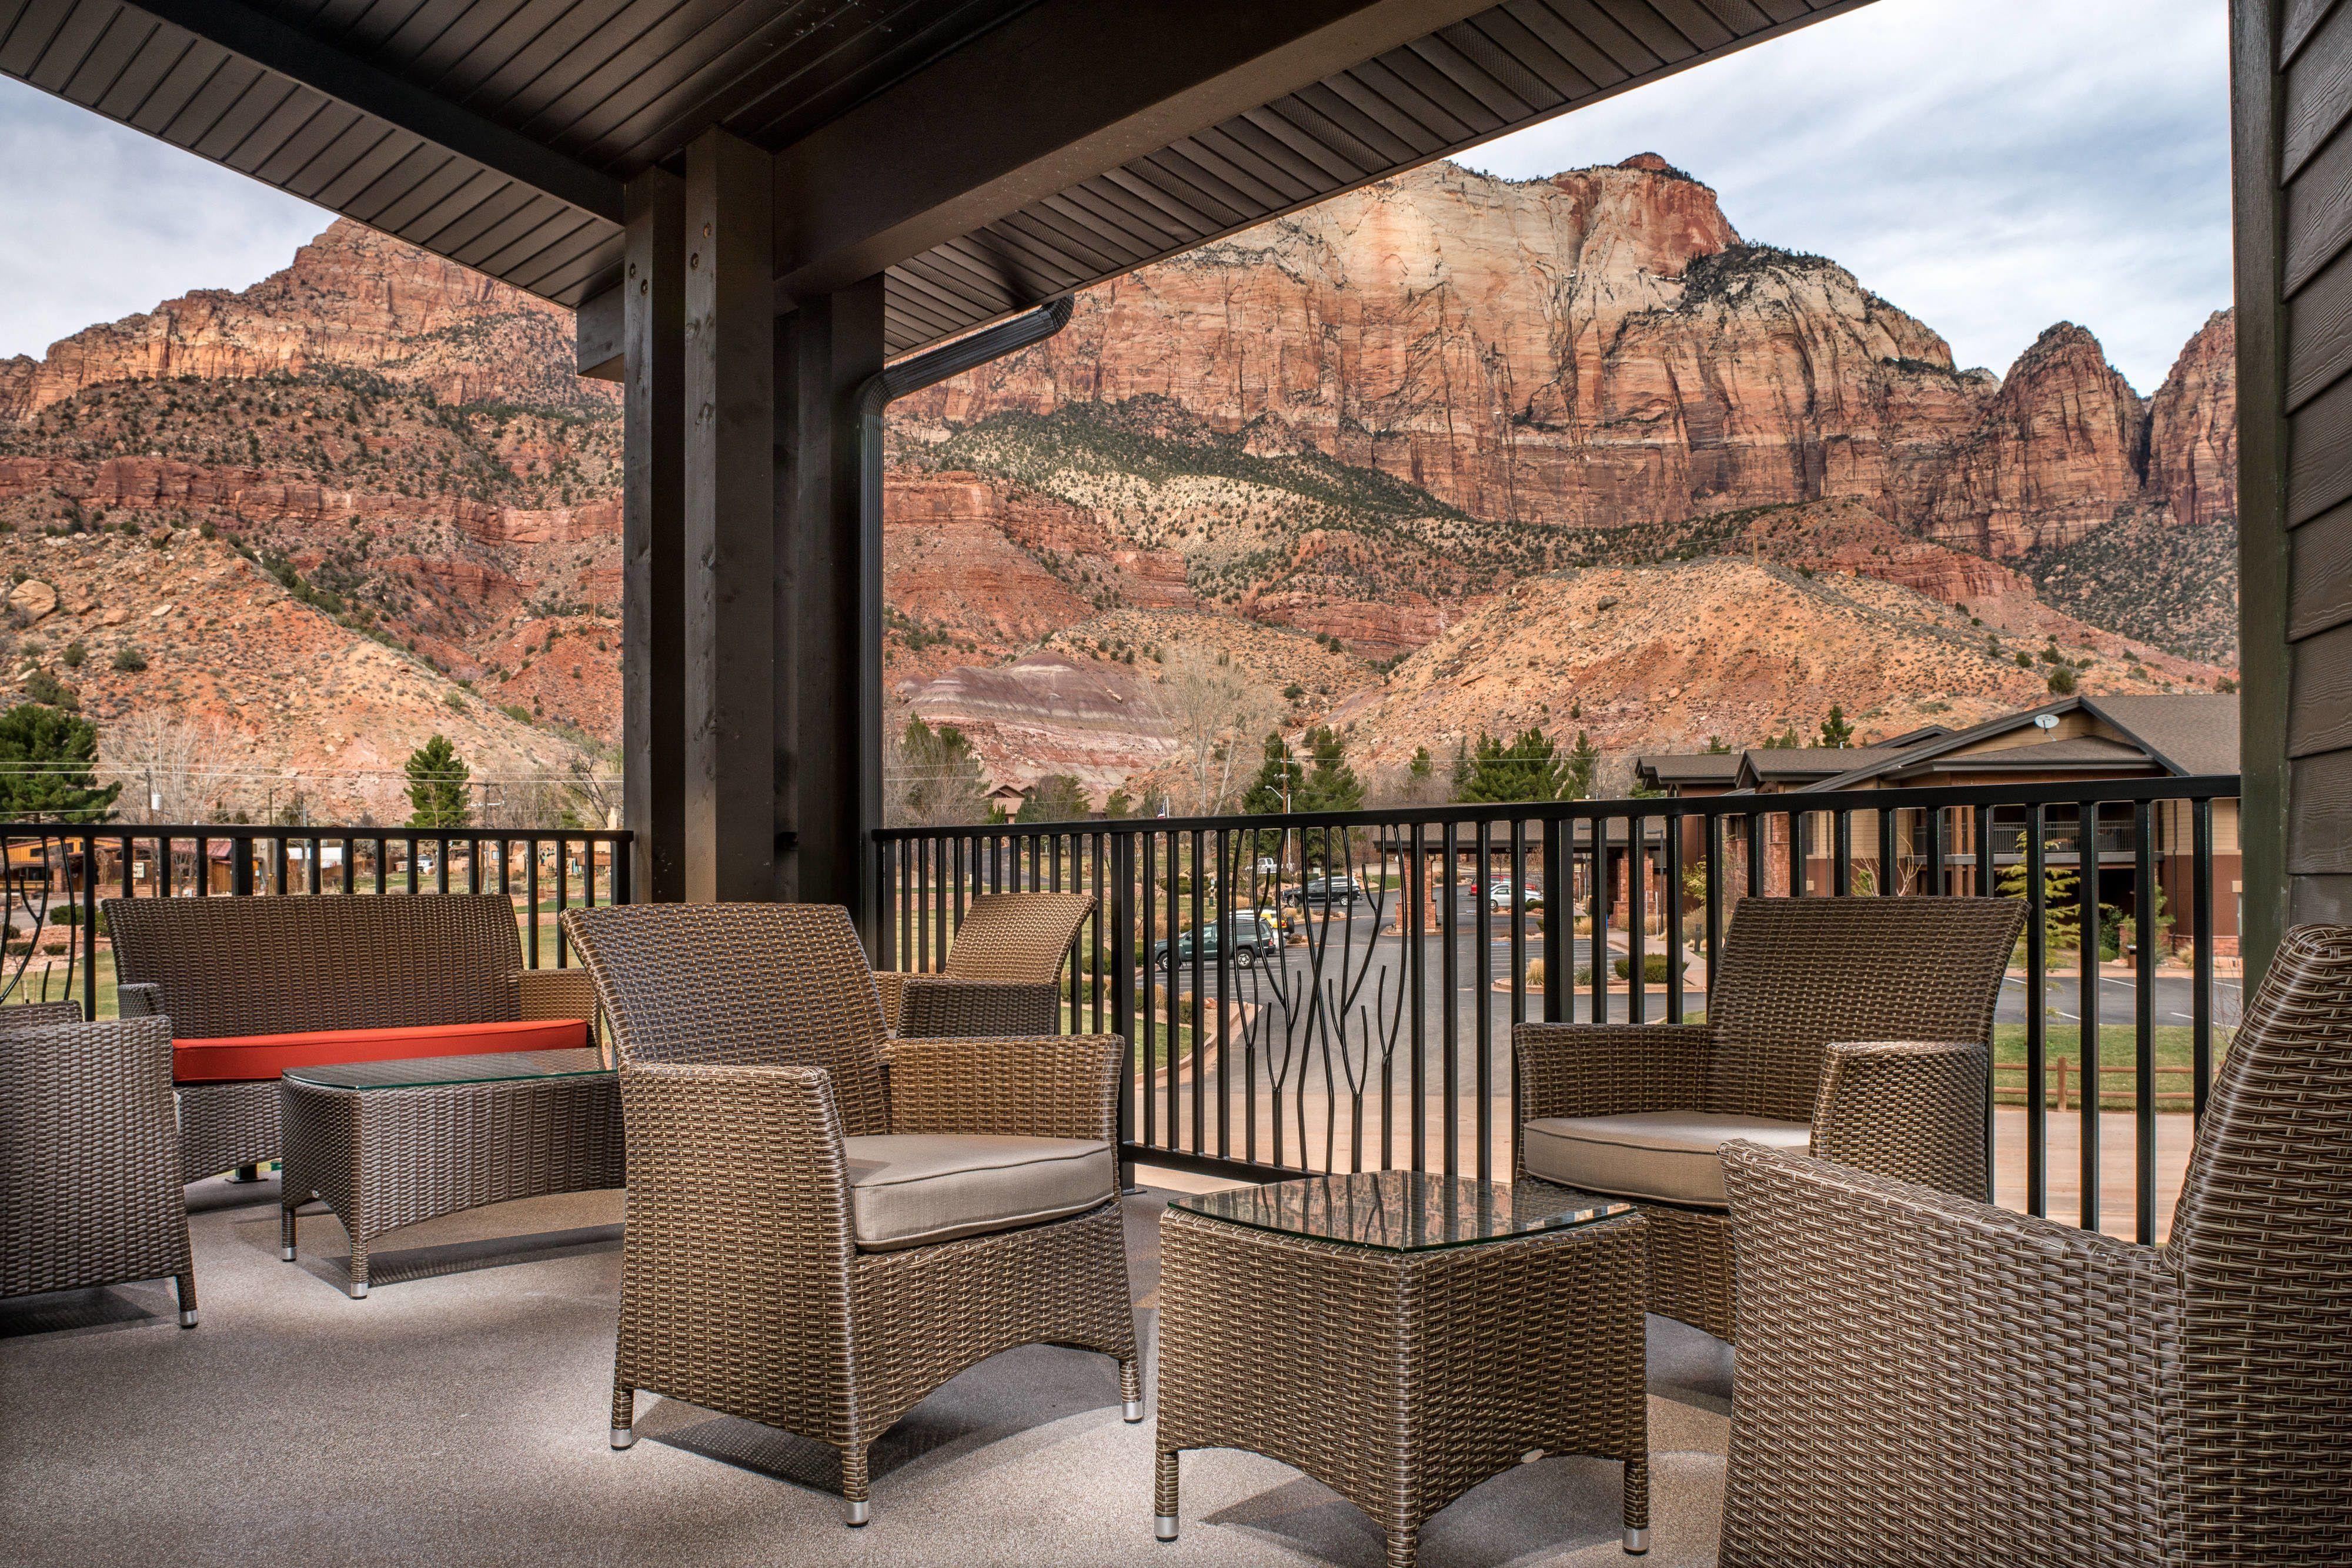 Springhill Suites Springdale Zion National Park Balcony Hotels